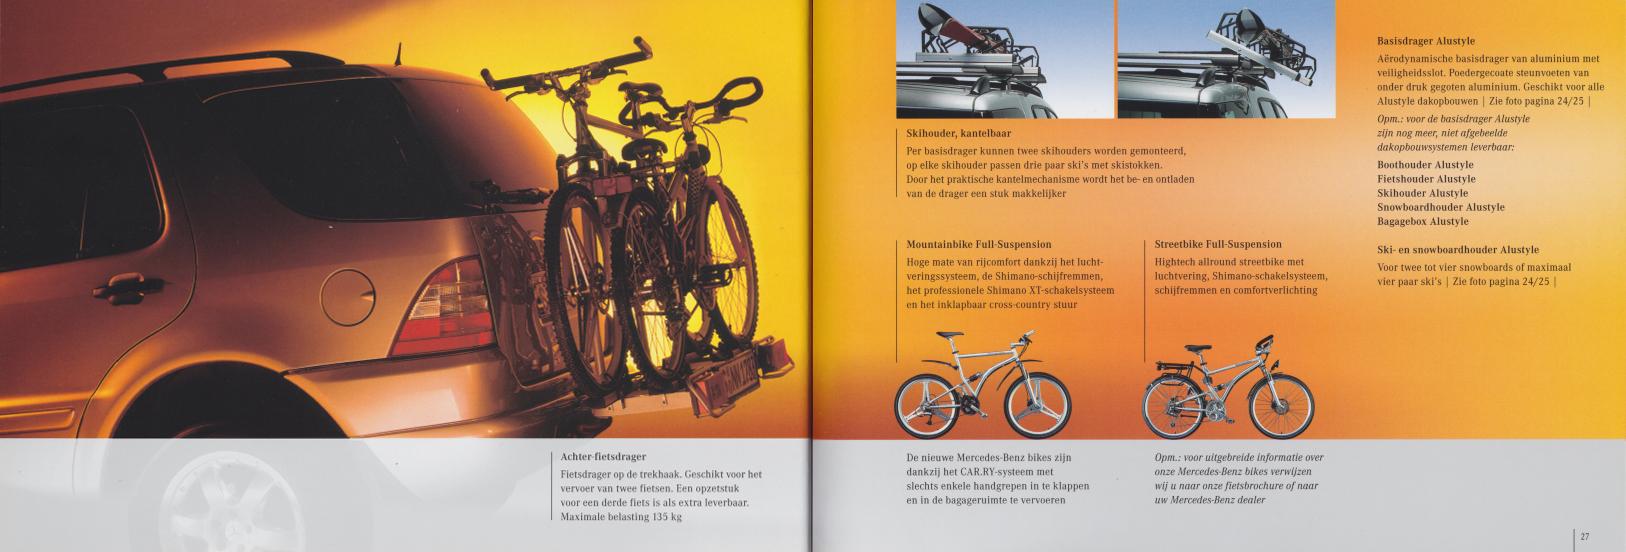 (W163): Catálogo 2001 - acessórios - neerlandês 014